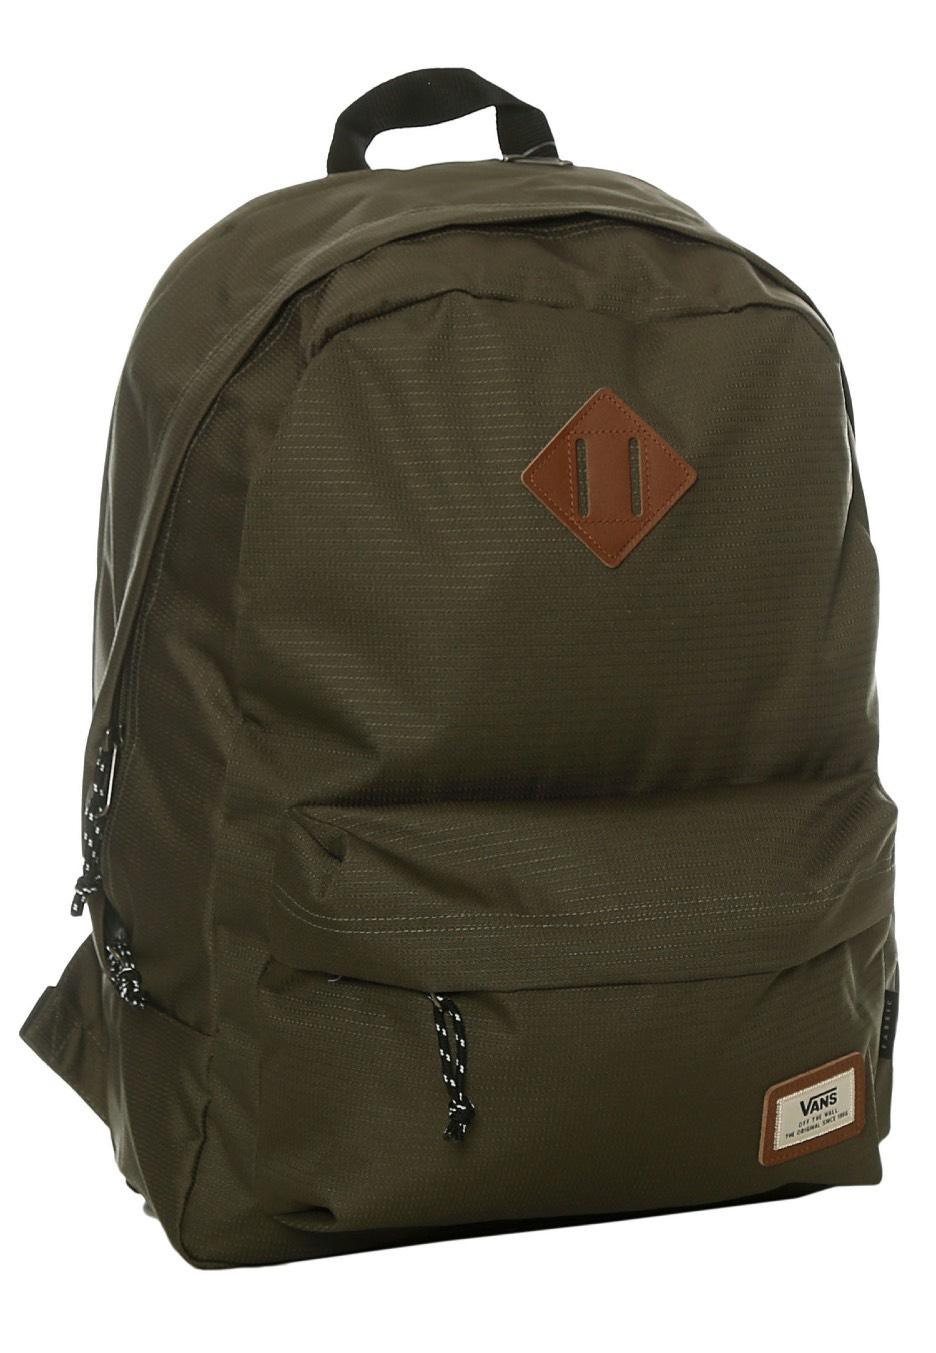 bb4f0702a9 Vans - Old Skool Plus Grape Leaf - Backpack - Impericon.com Worldwide